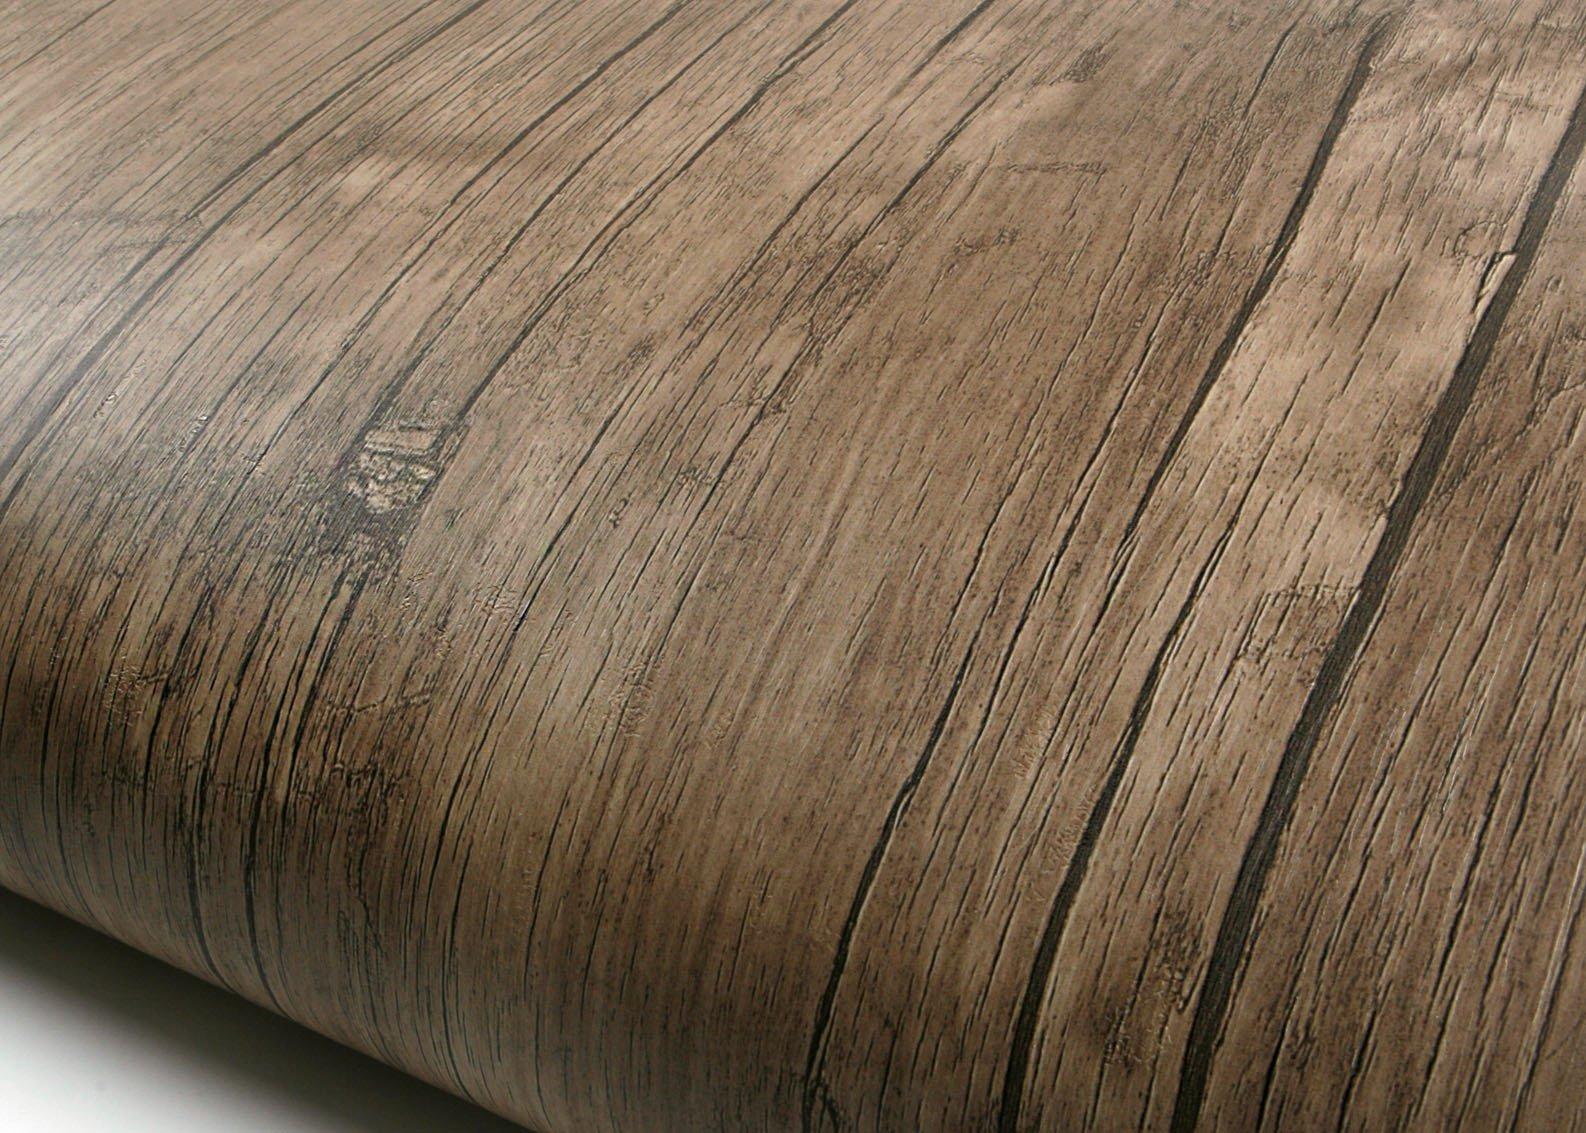 ROSEROSA Peel & Stick Backsplash Sycamore Antique Wood Textured Vinyl Contact Paper Self-adhesive Wallpaper Shelf Liner Table and Door Reform (PF4034-1 : 2.00 Feet X 6.56 Feet)